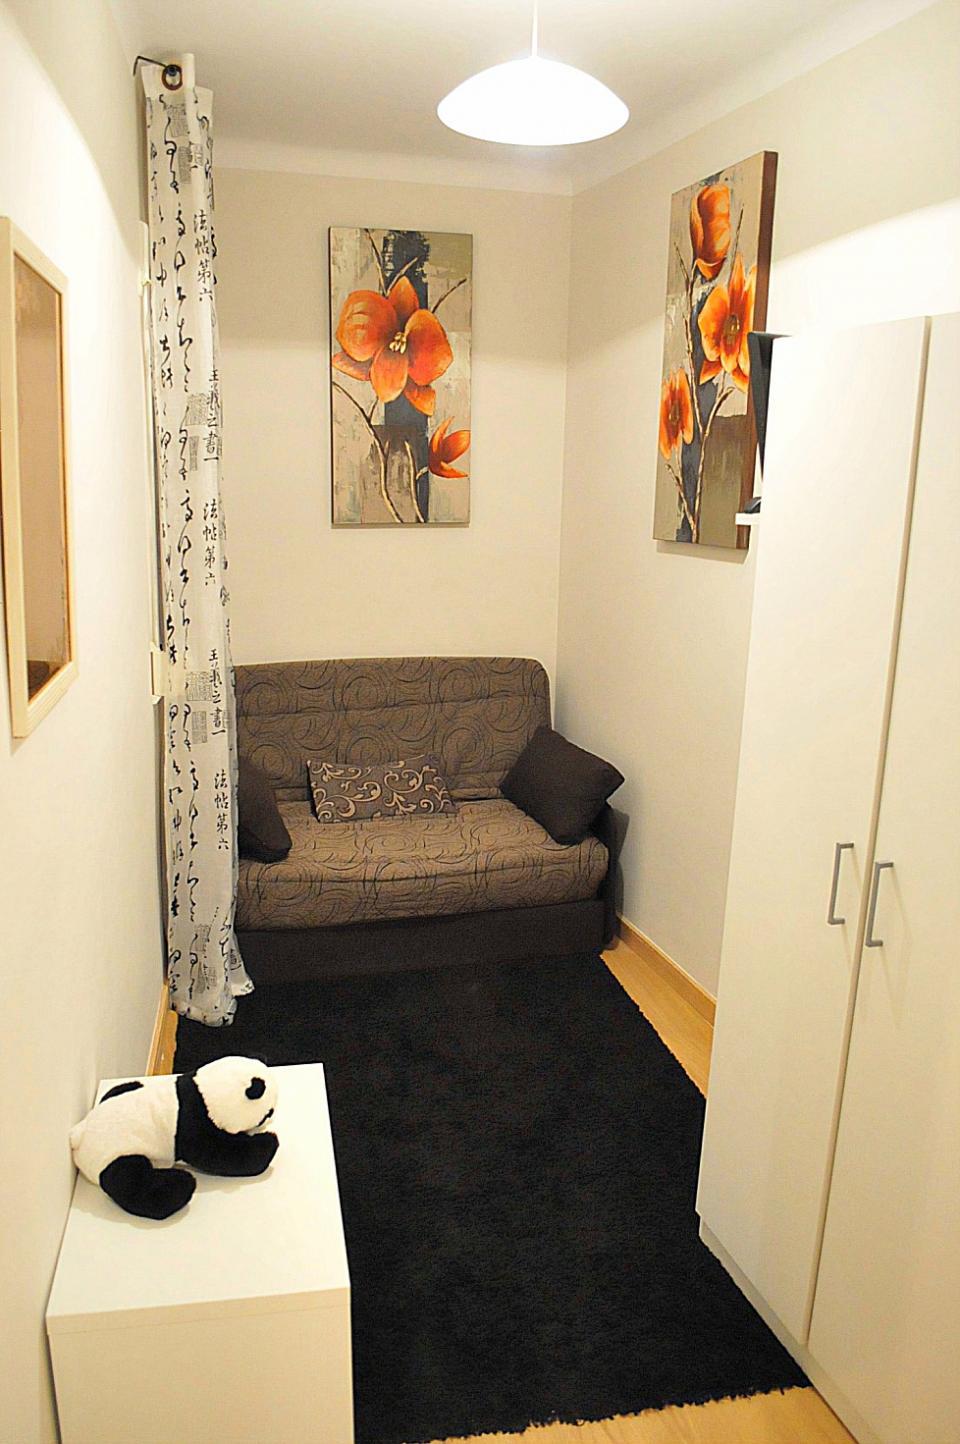 Habitaci n en alquiler plaza espa a barcelona home for Alquiler habitacion espana